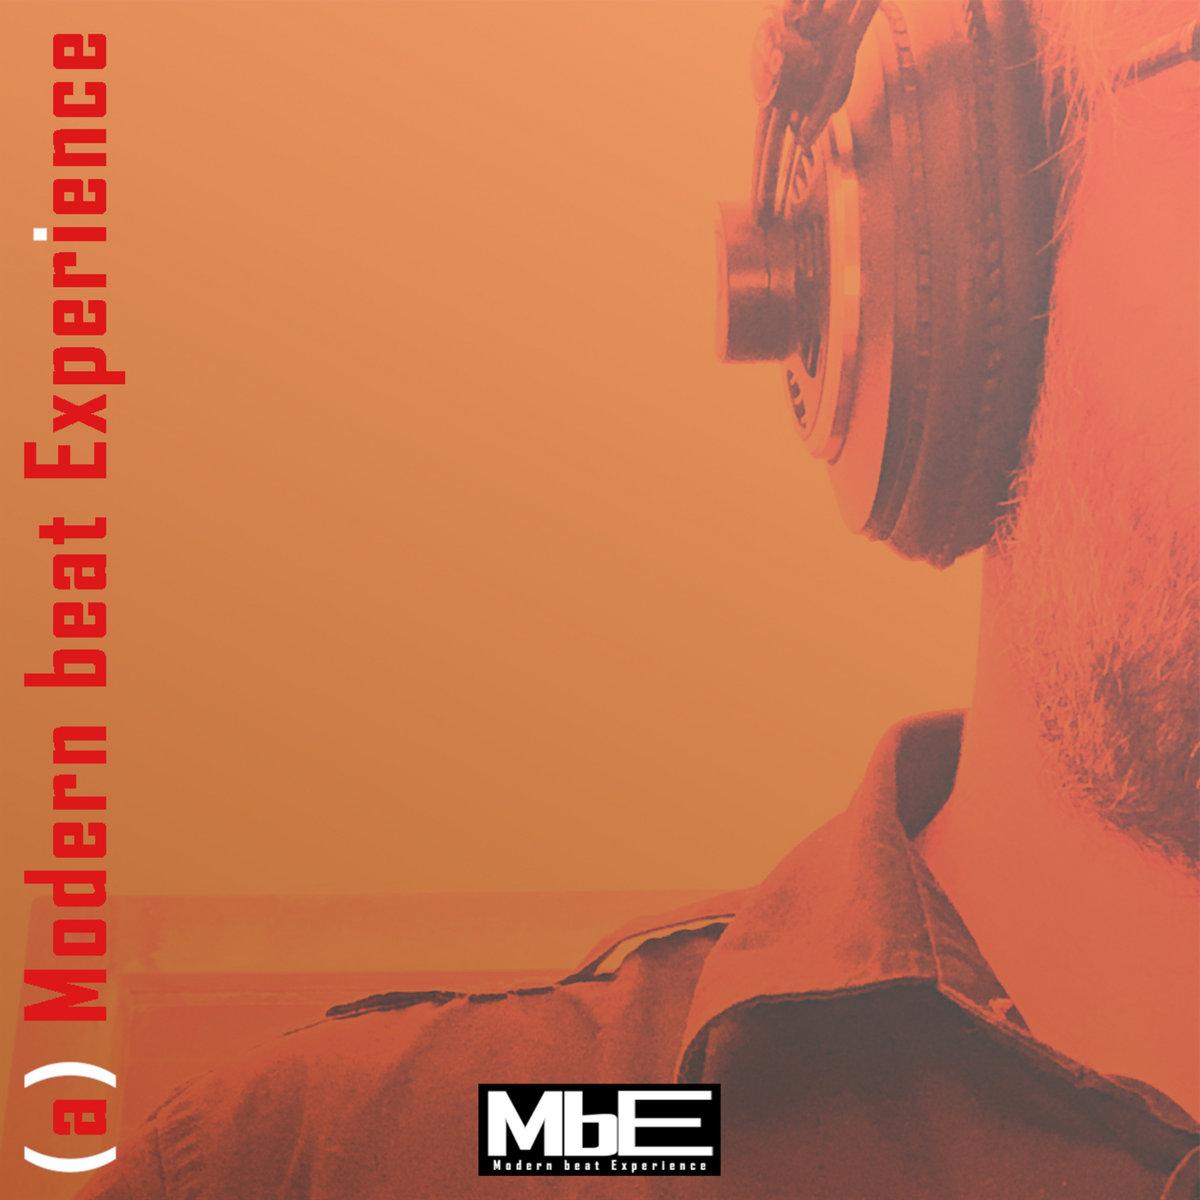 Modern Beat Experience - (a) - Officine Musicali - Sassari - Bandcamp - player - 2019 - Sa Scena Sarda